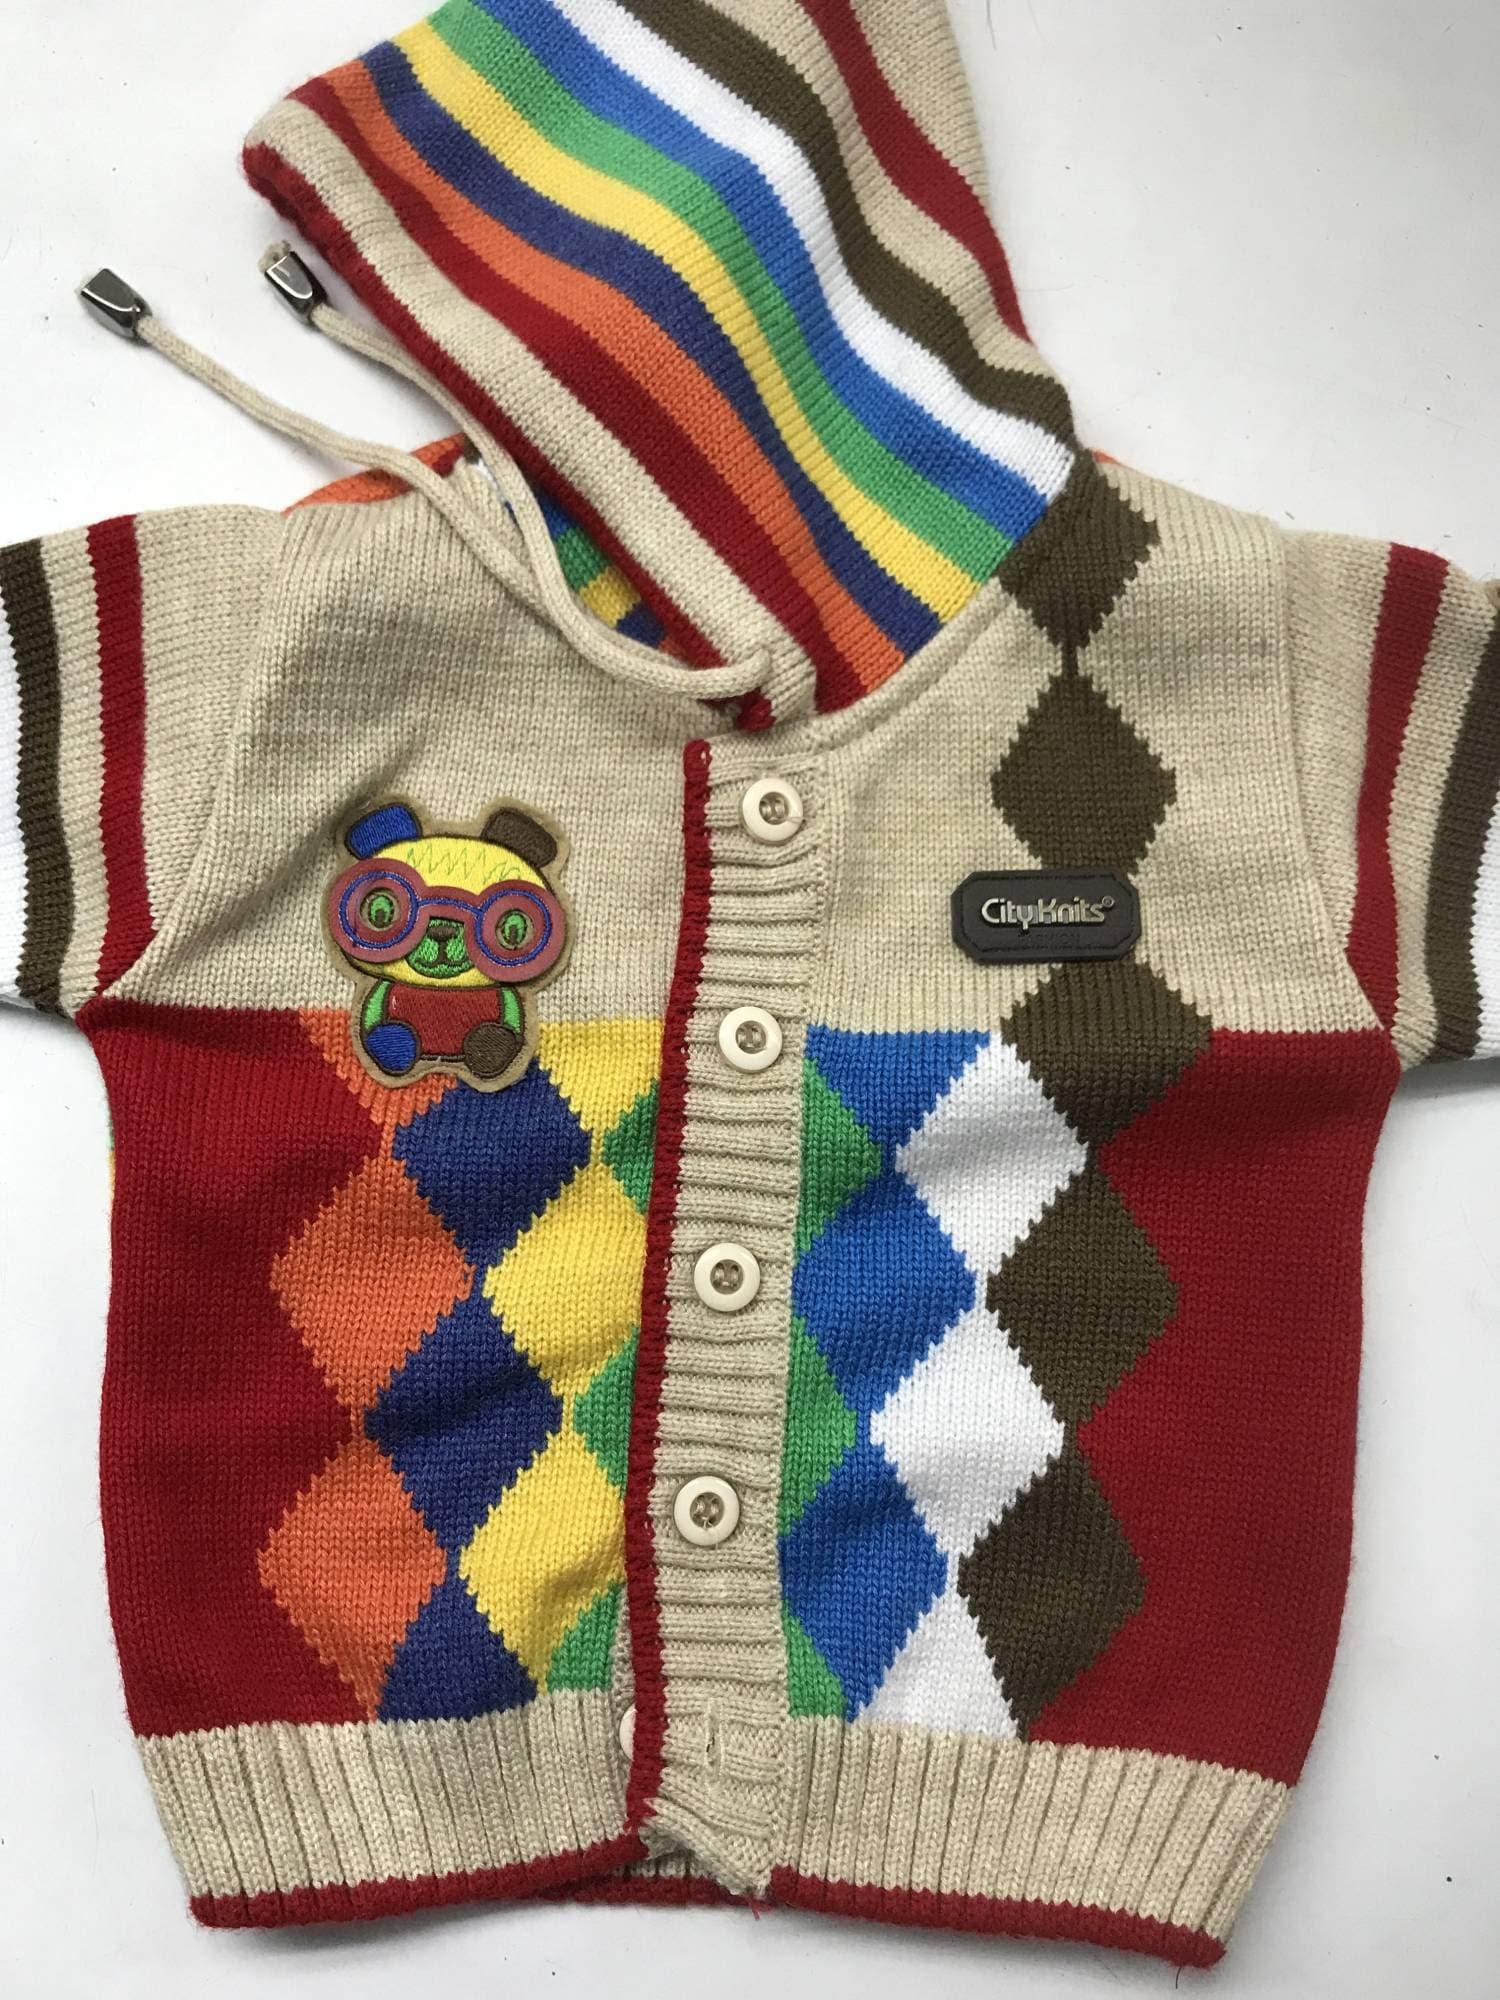 efa84aae9 Top 50 Baby Readymade Garment Wholesalers in Ac Market - Best Baby ...